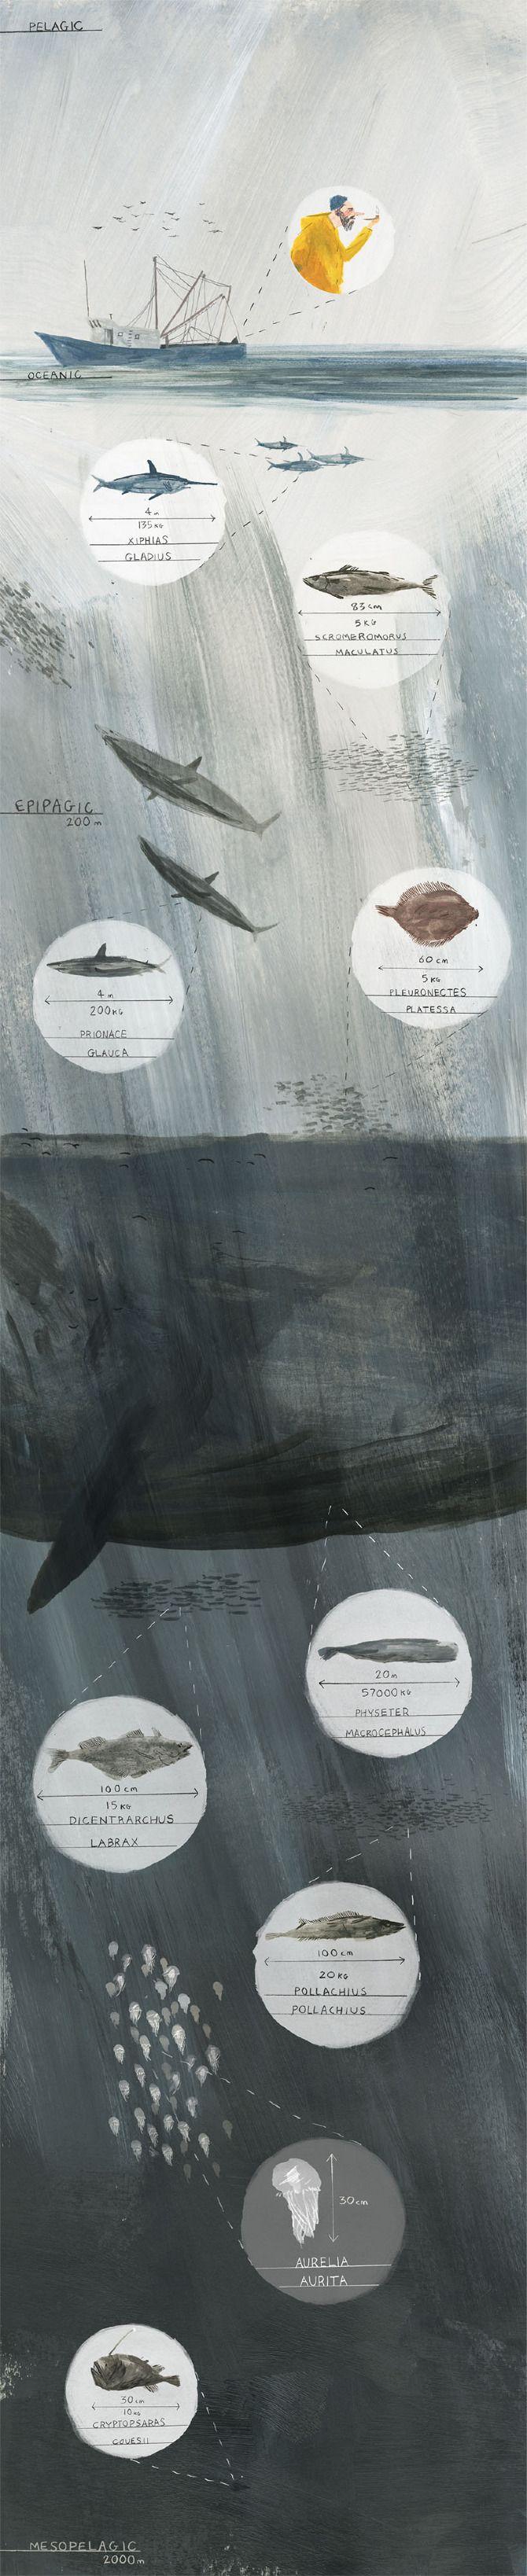 art, illustration, ocean, water, whale, fish, depths, // Joe Todd Stanton.